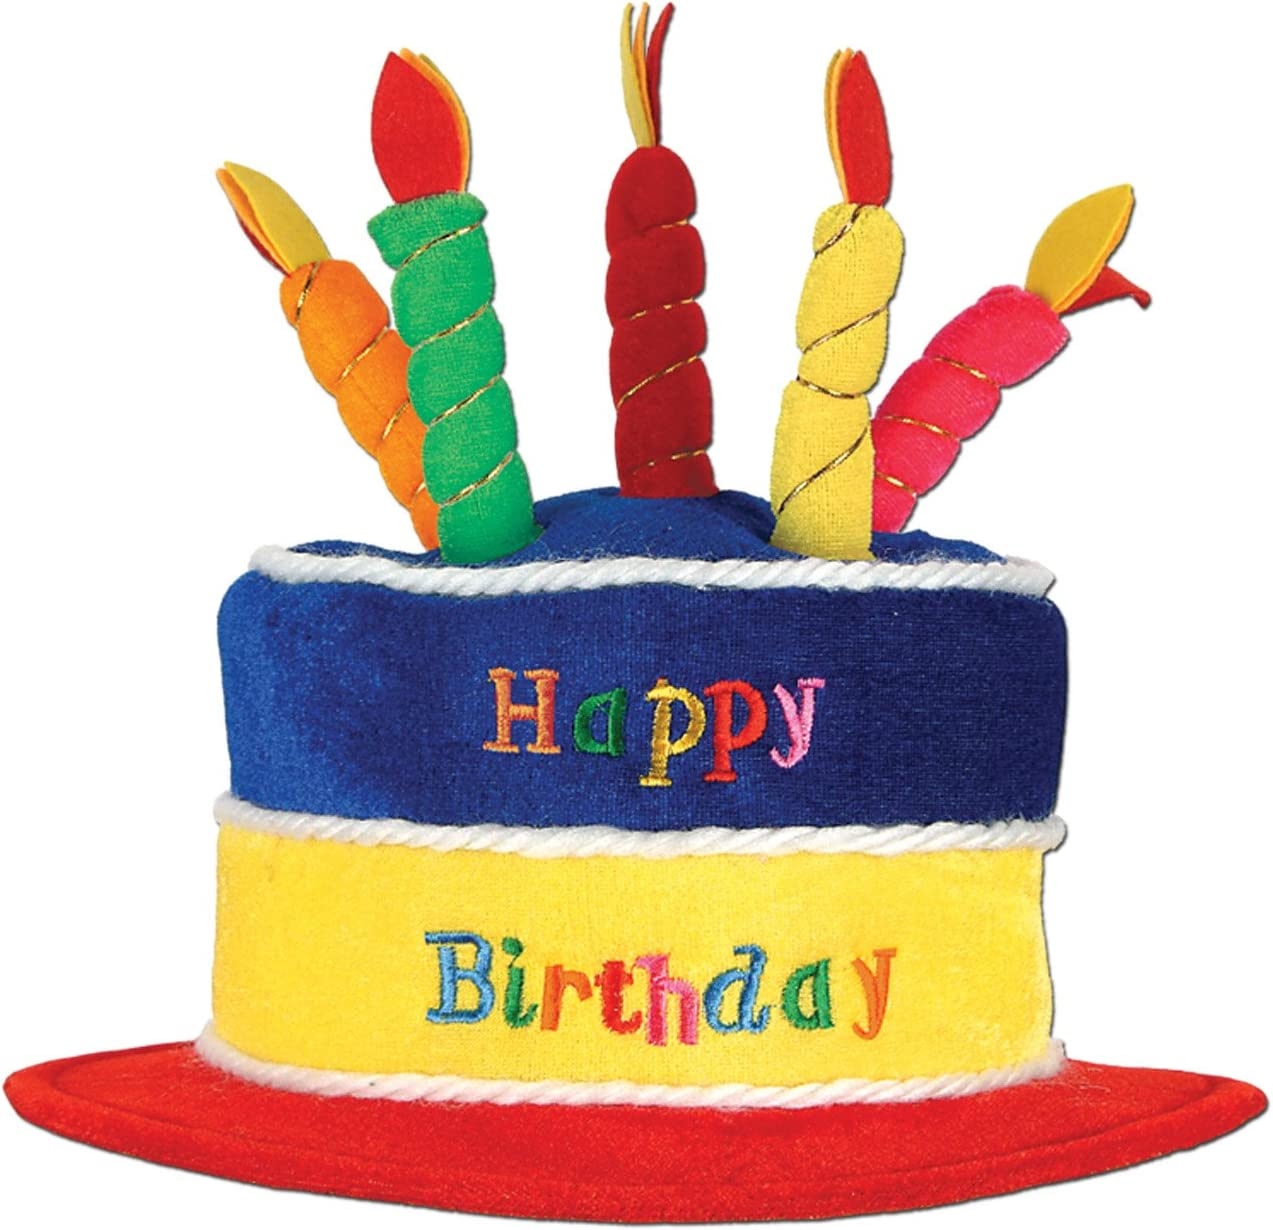 Awe Inspiring Amazon Com Beistle 60717 Plush Birthday Cake Hat Kitchen Dining Funny Birthday Cards Online Inifofree Goldxyz